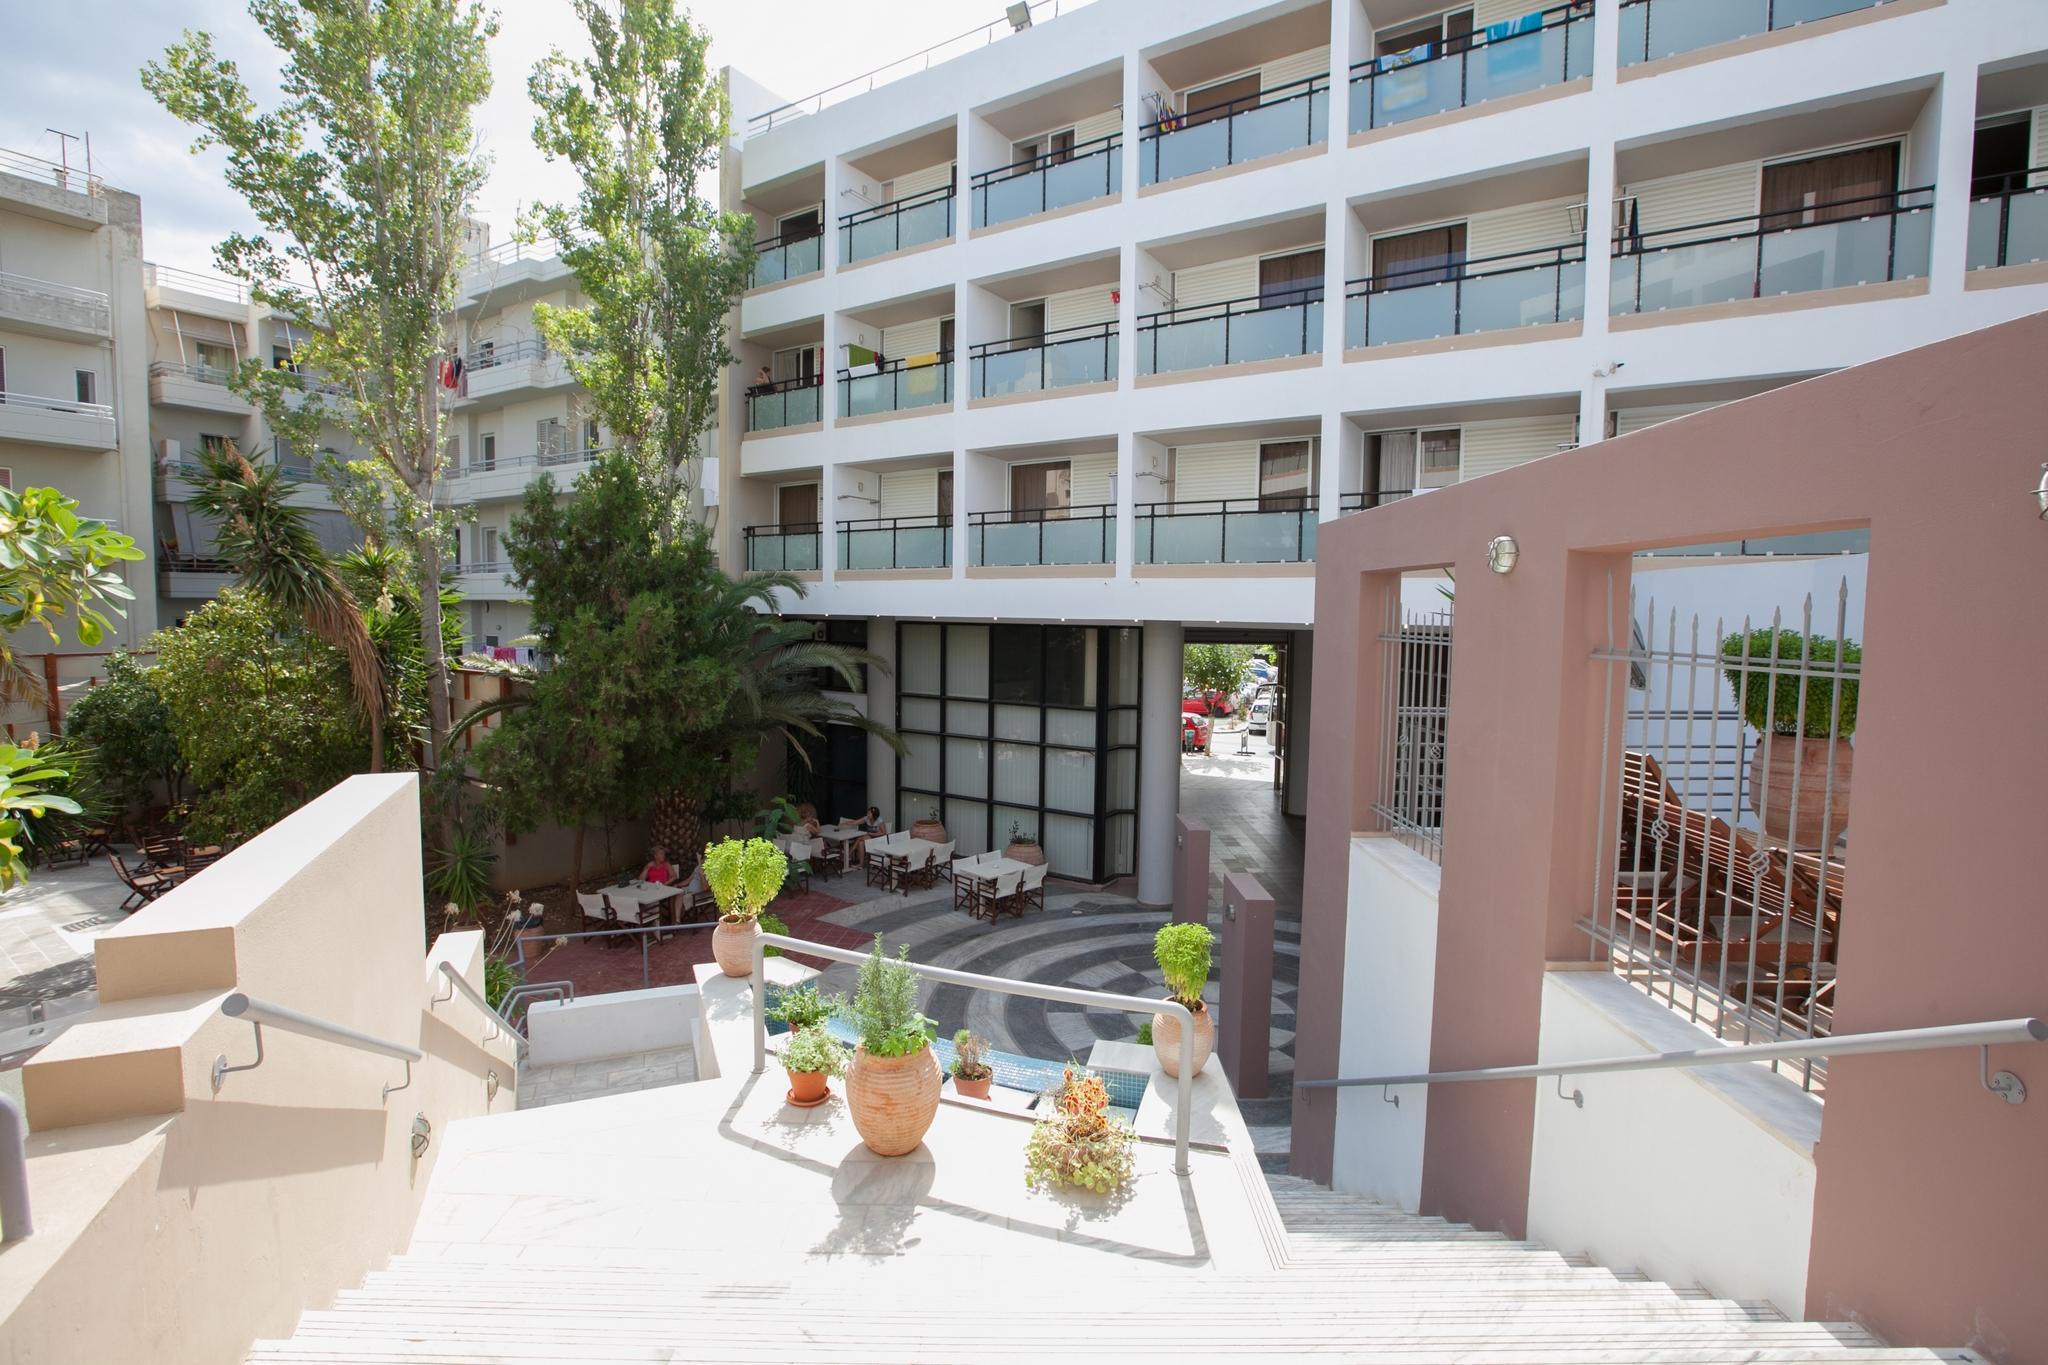 Santa Marina Hotel – Άγιος Νικολαος Κρητης ✦ 4 Ημερες (3 Διανυκτερευσεις) ✦ 2 Άτομα ✦ All Inclusive ✦ 01/07 εως 14/07 και 29/08 εως 24/09 ✦ Κοντα σε Παραλια!